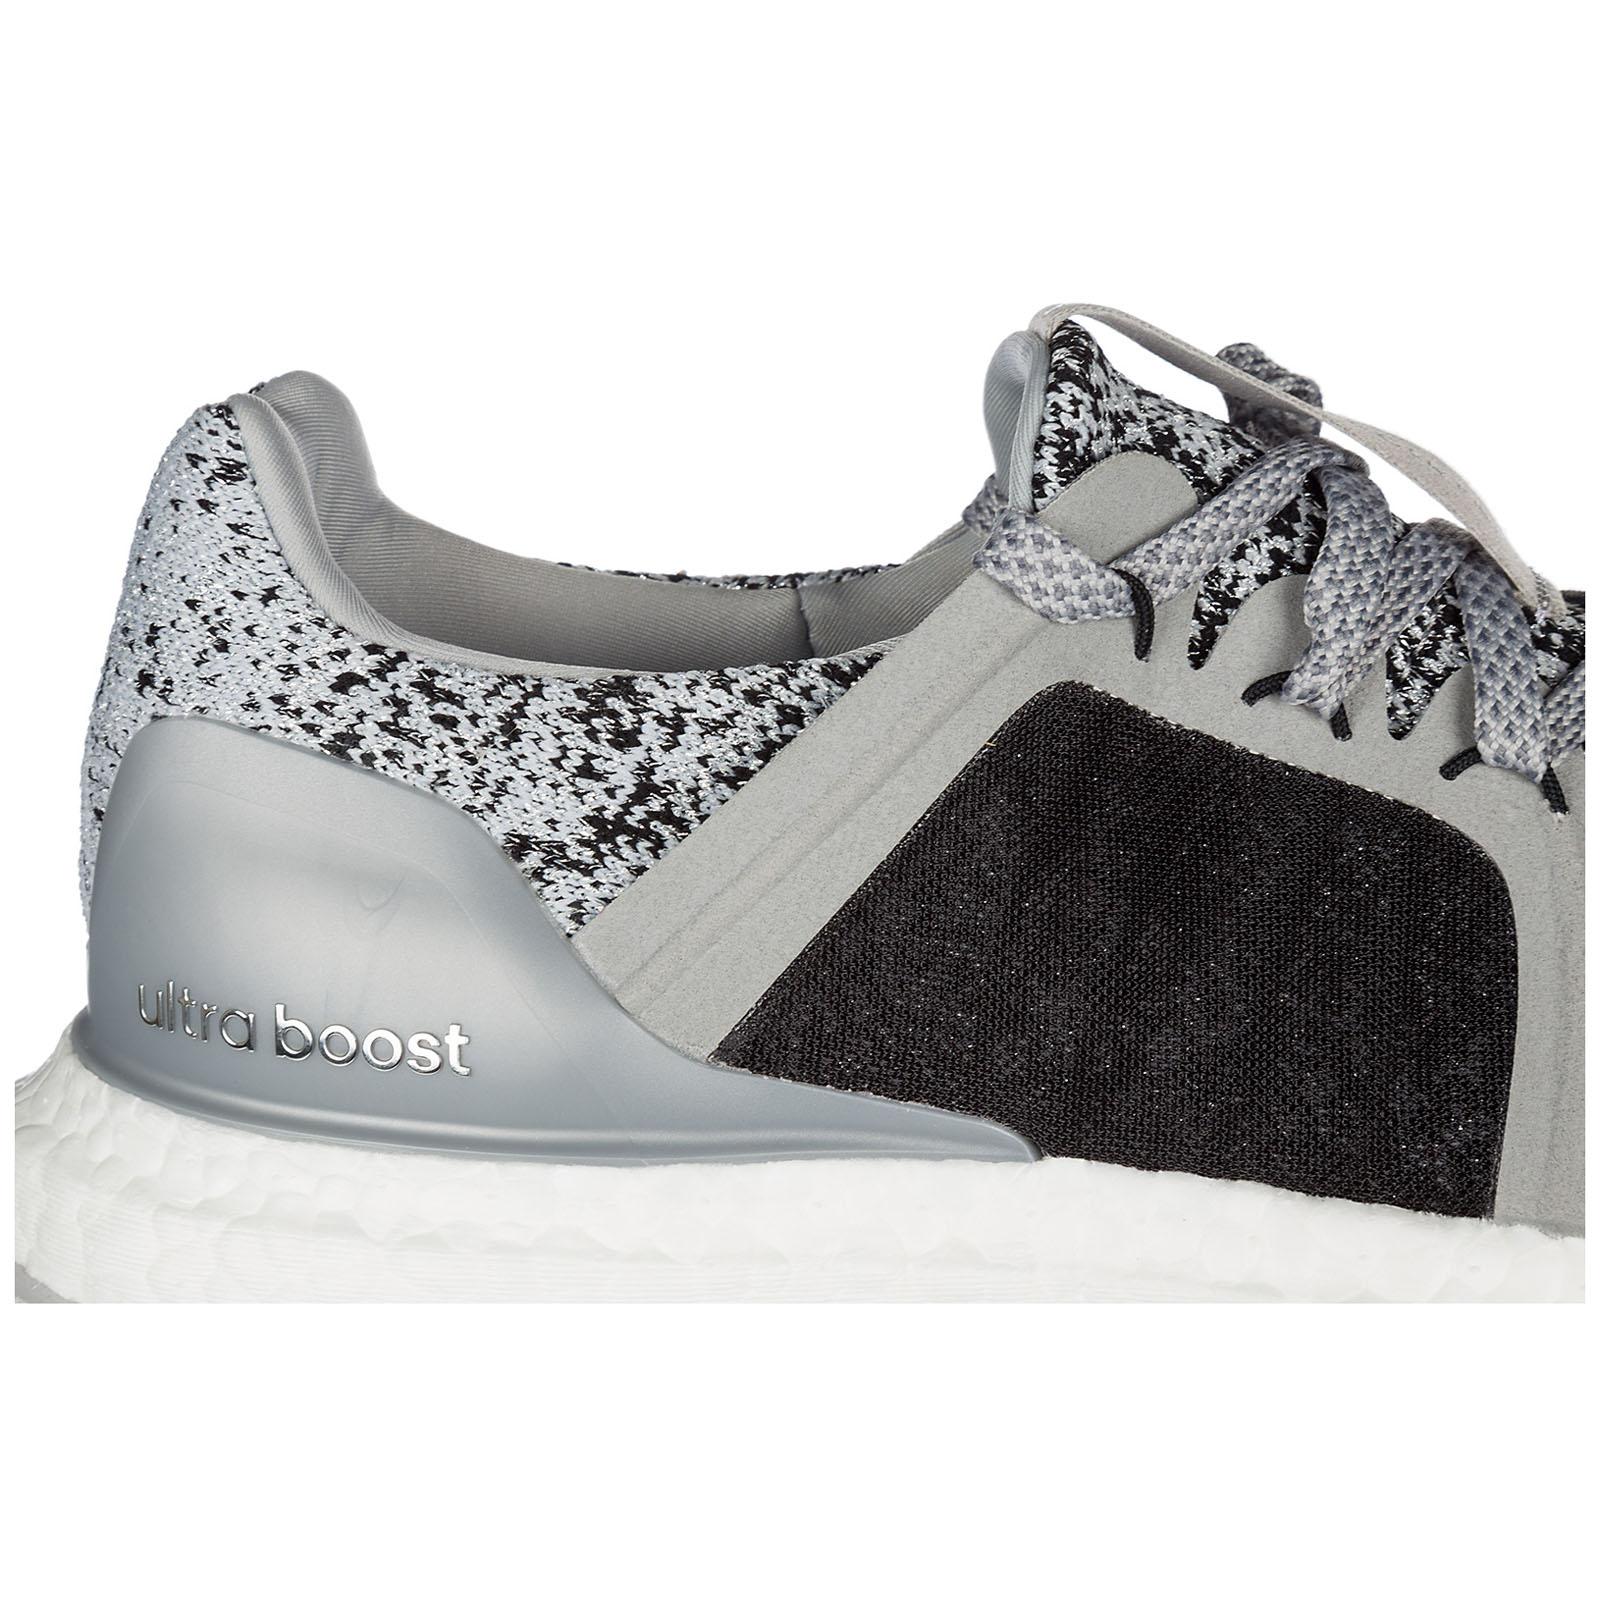 fd5c3512de1d9 Sneakers Adidas by Stella McCartney S80846 grigio